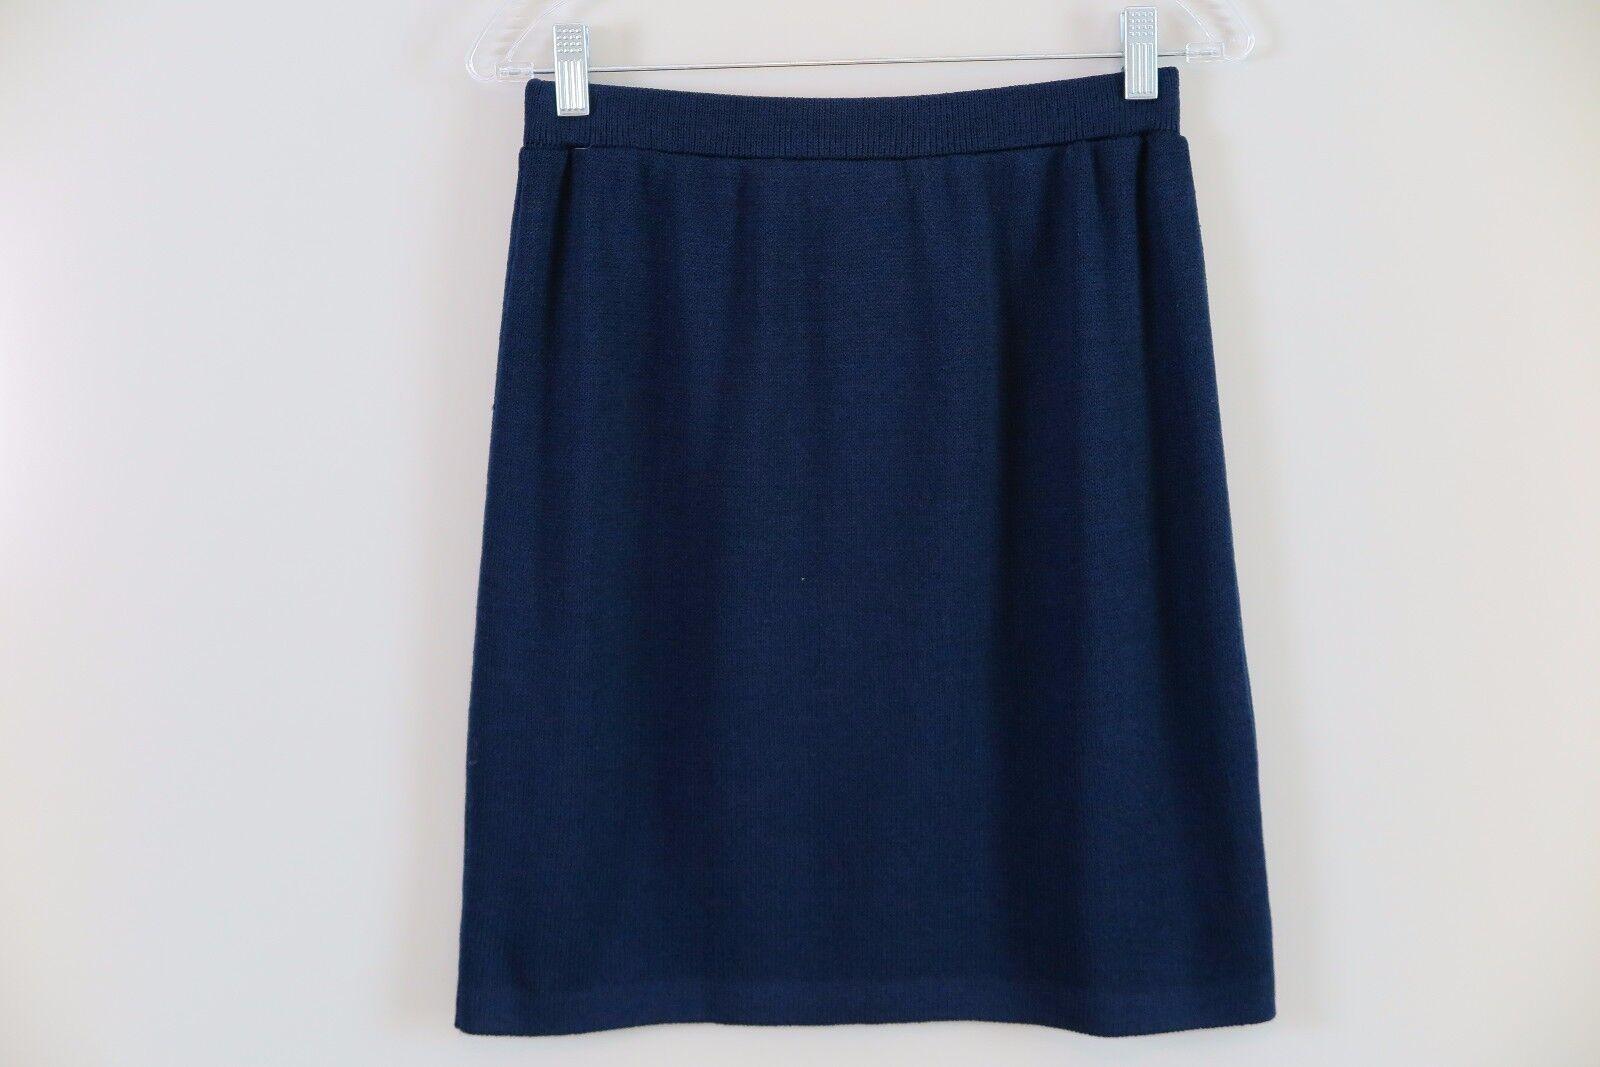 ST. JOHN COLLECTION Navy bluee Santana Knit Straight Skirt Size 6 Made in USA